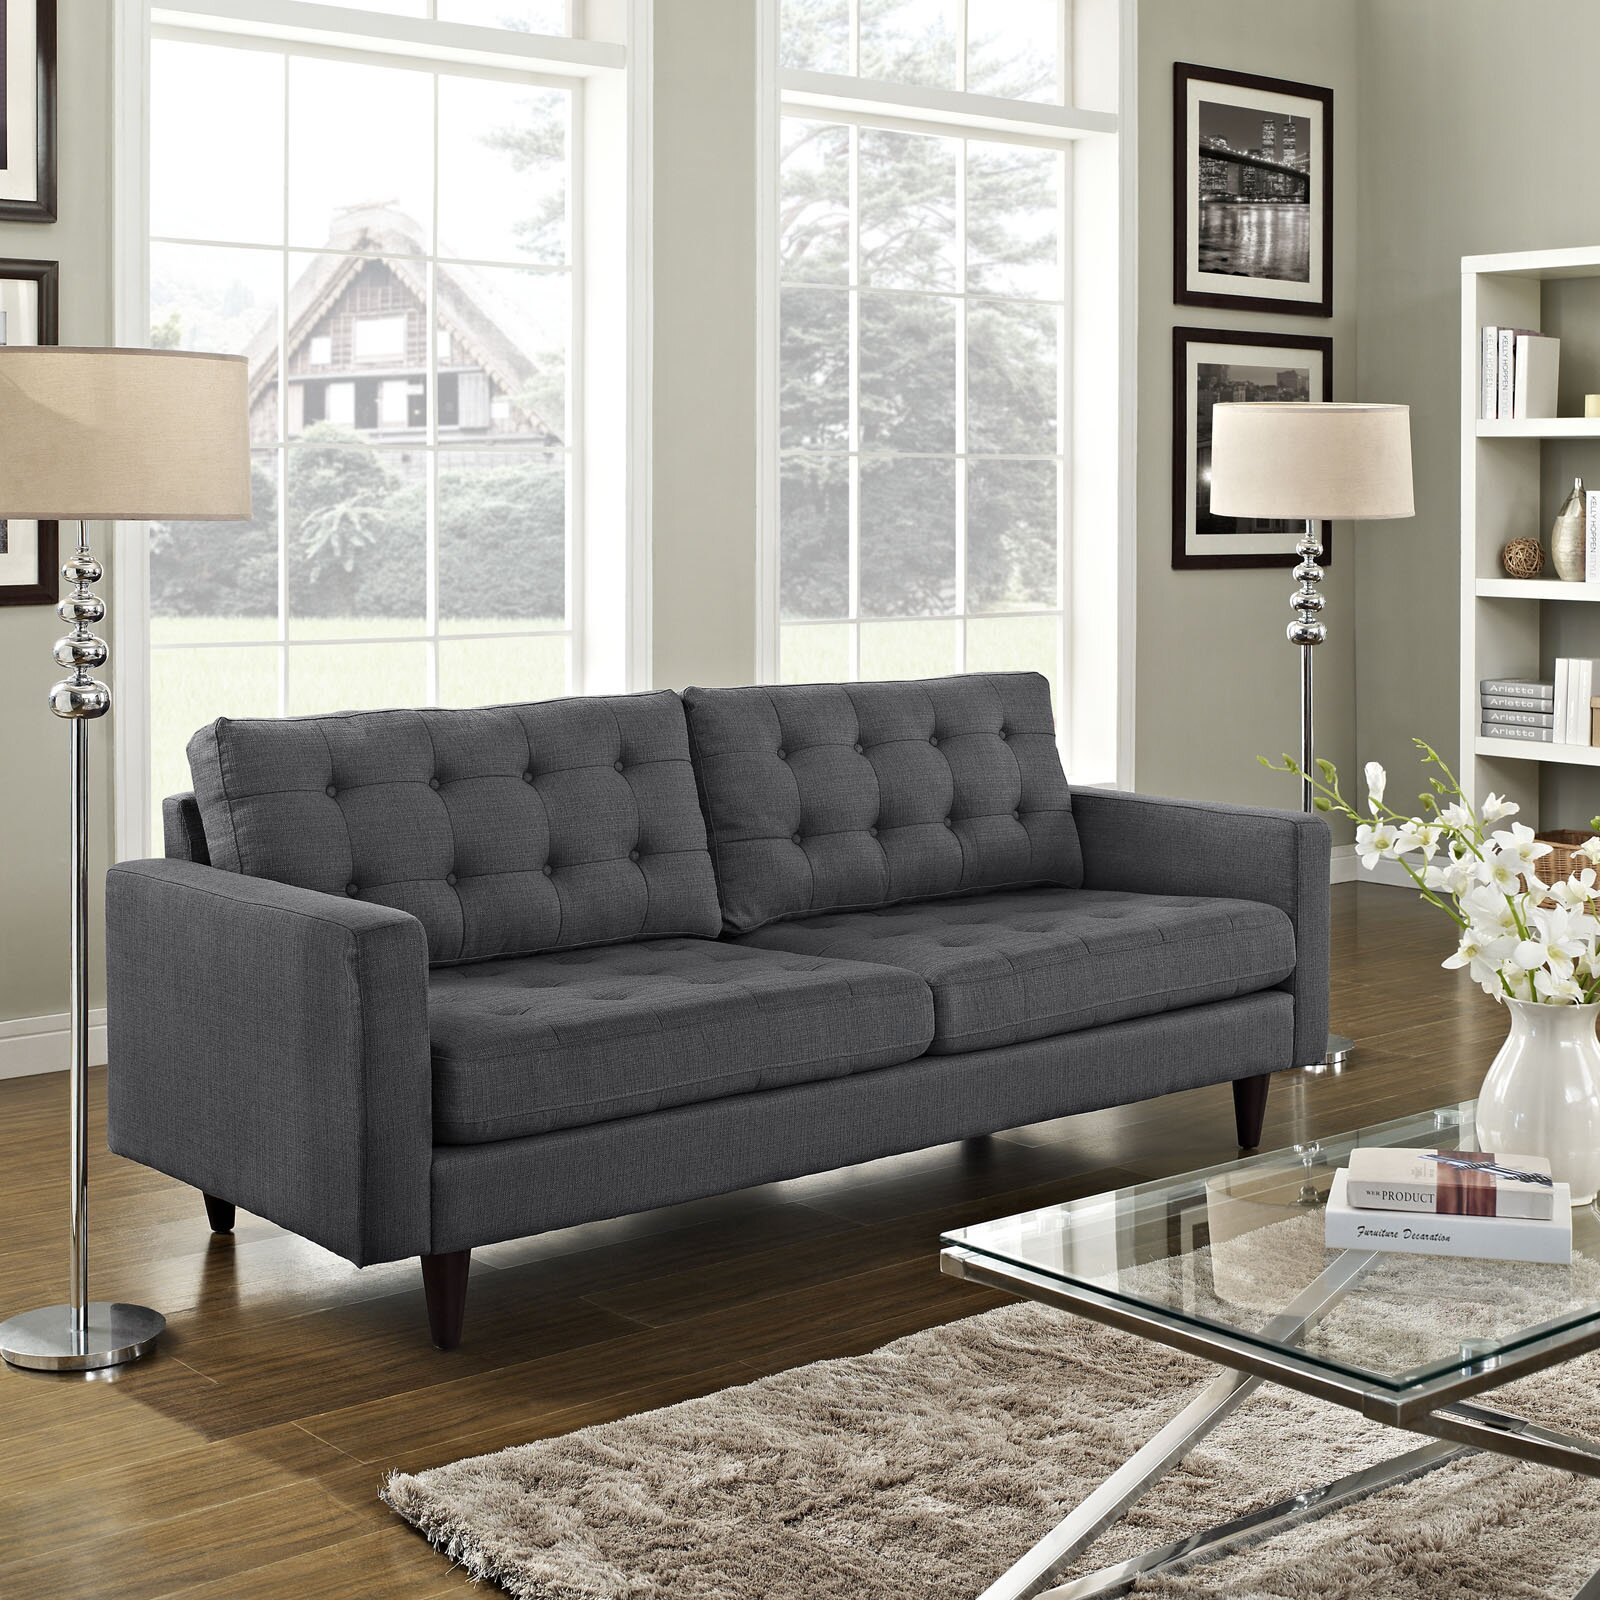 modern contemporary sofa - Rustic Modern Decor